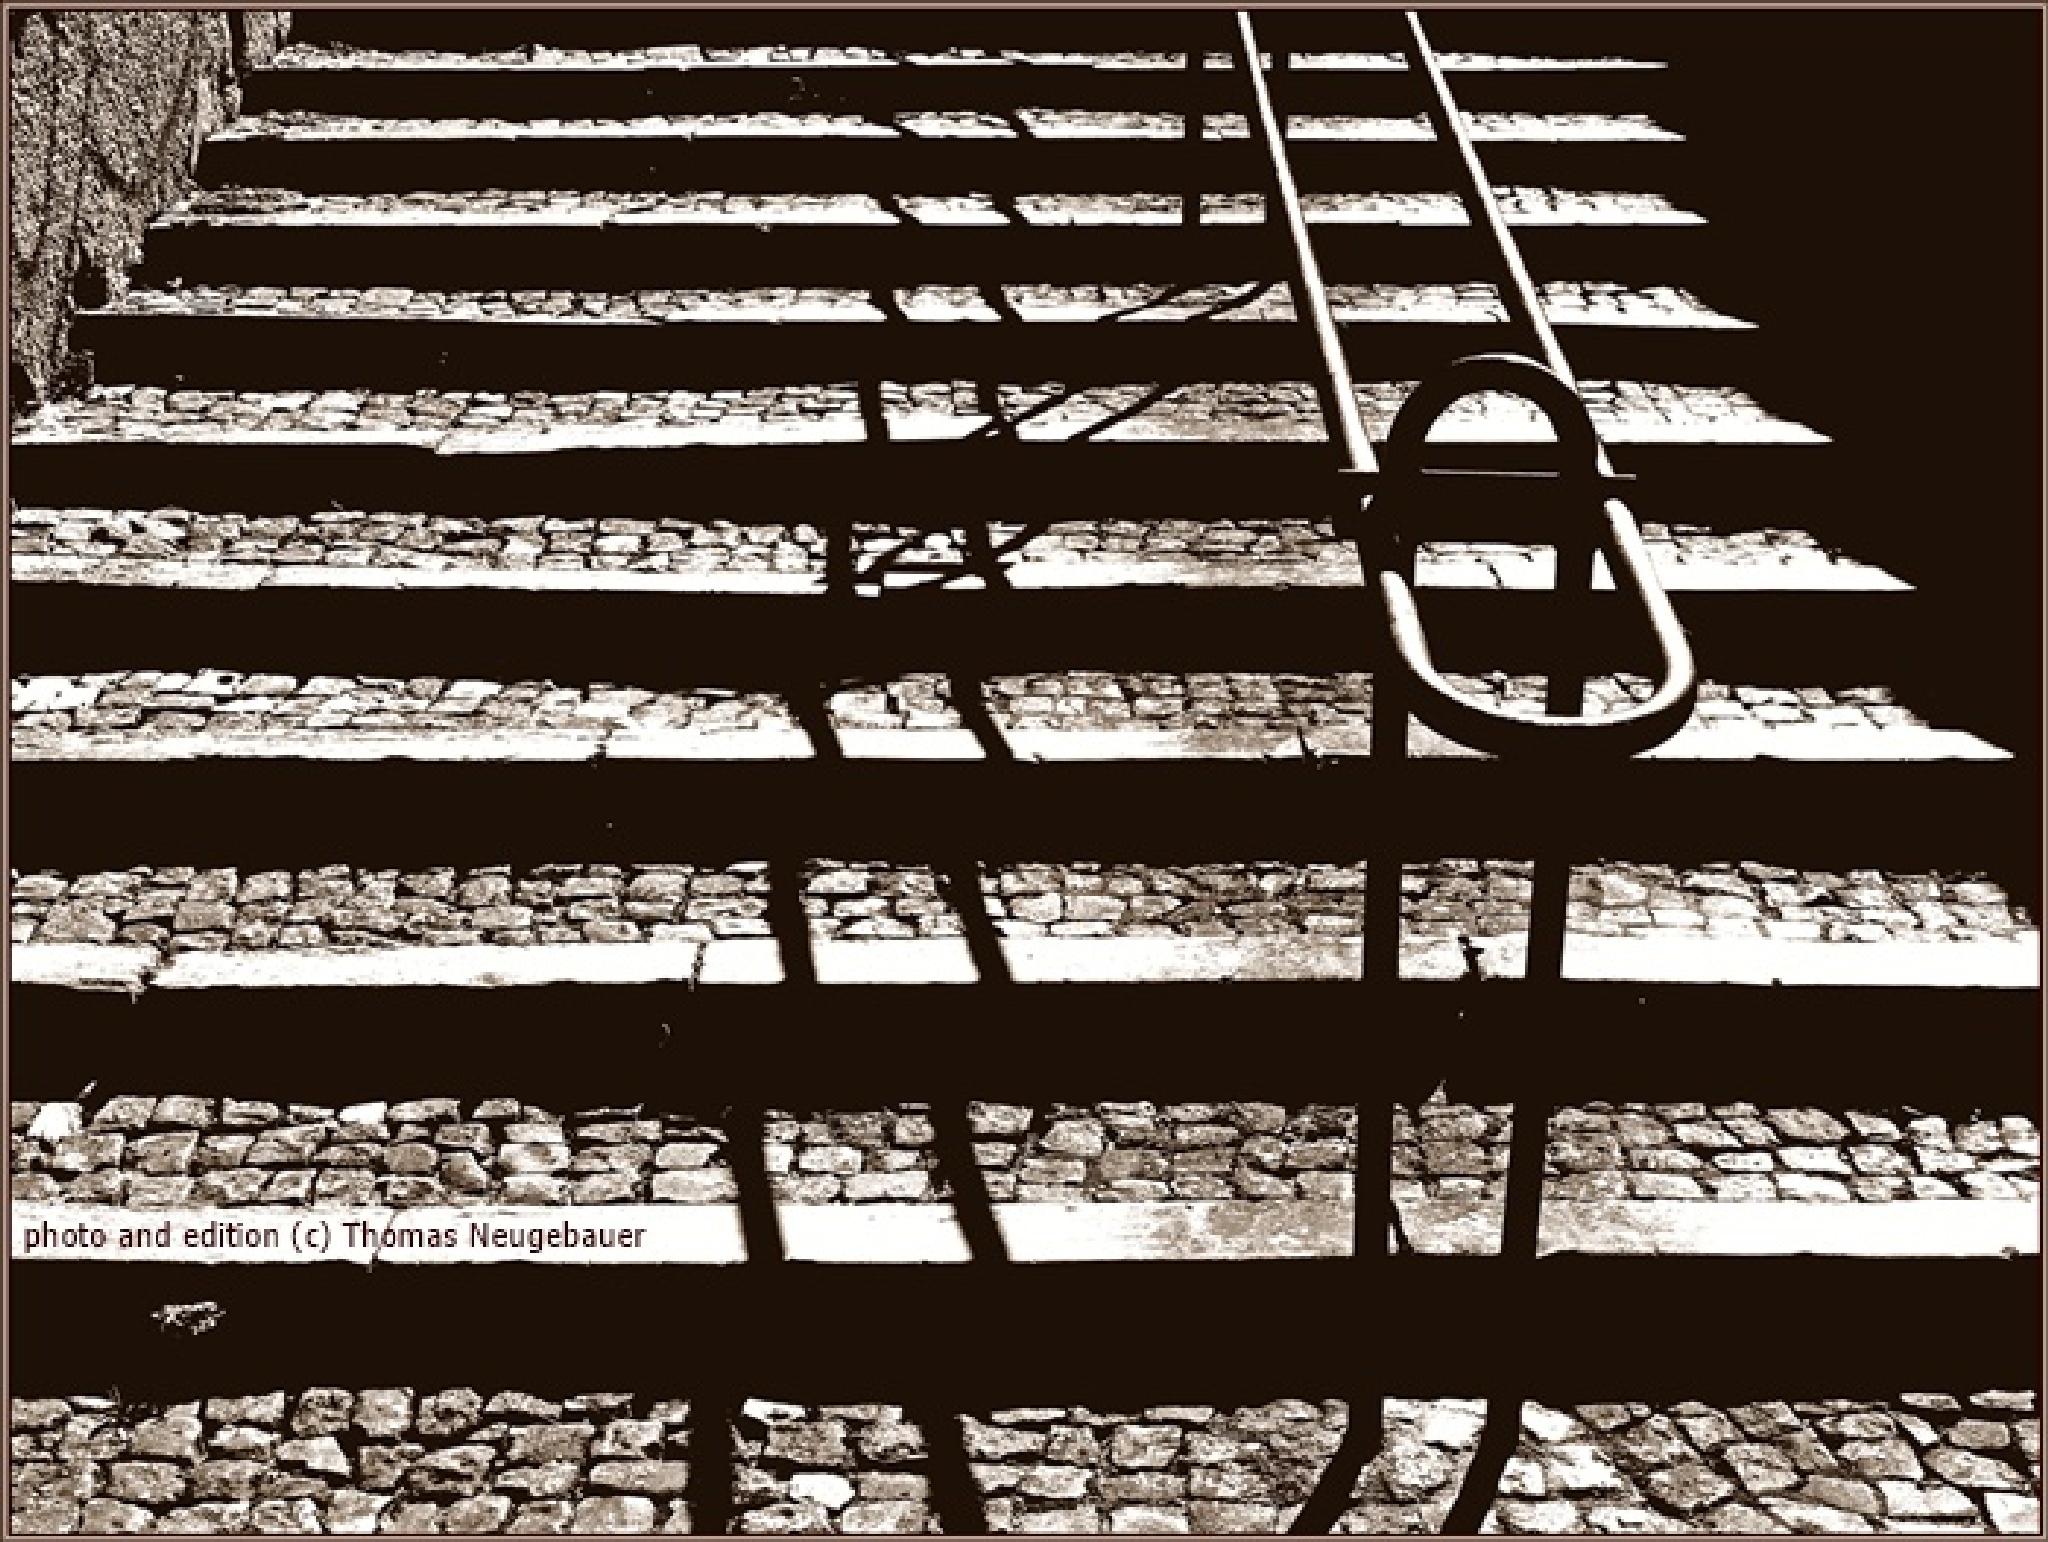 # 604 by Thomas Neugebauer